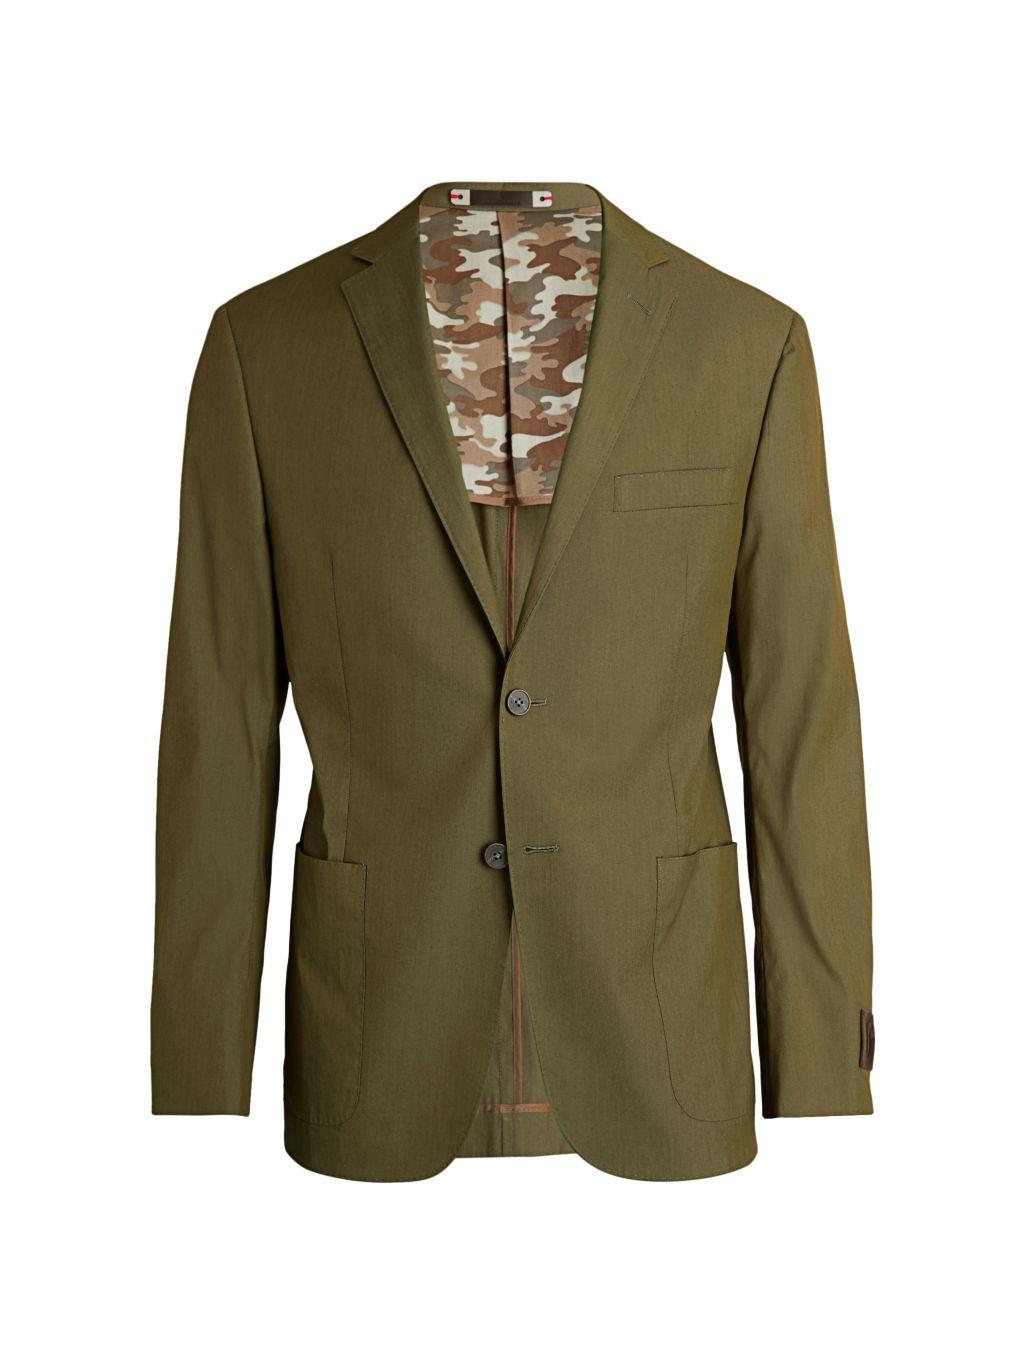 Hickey Freeman Perry Sportcoat